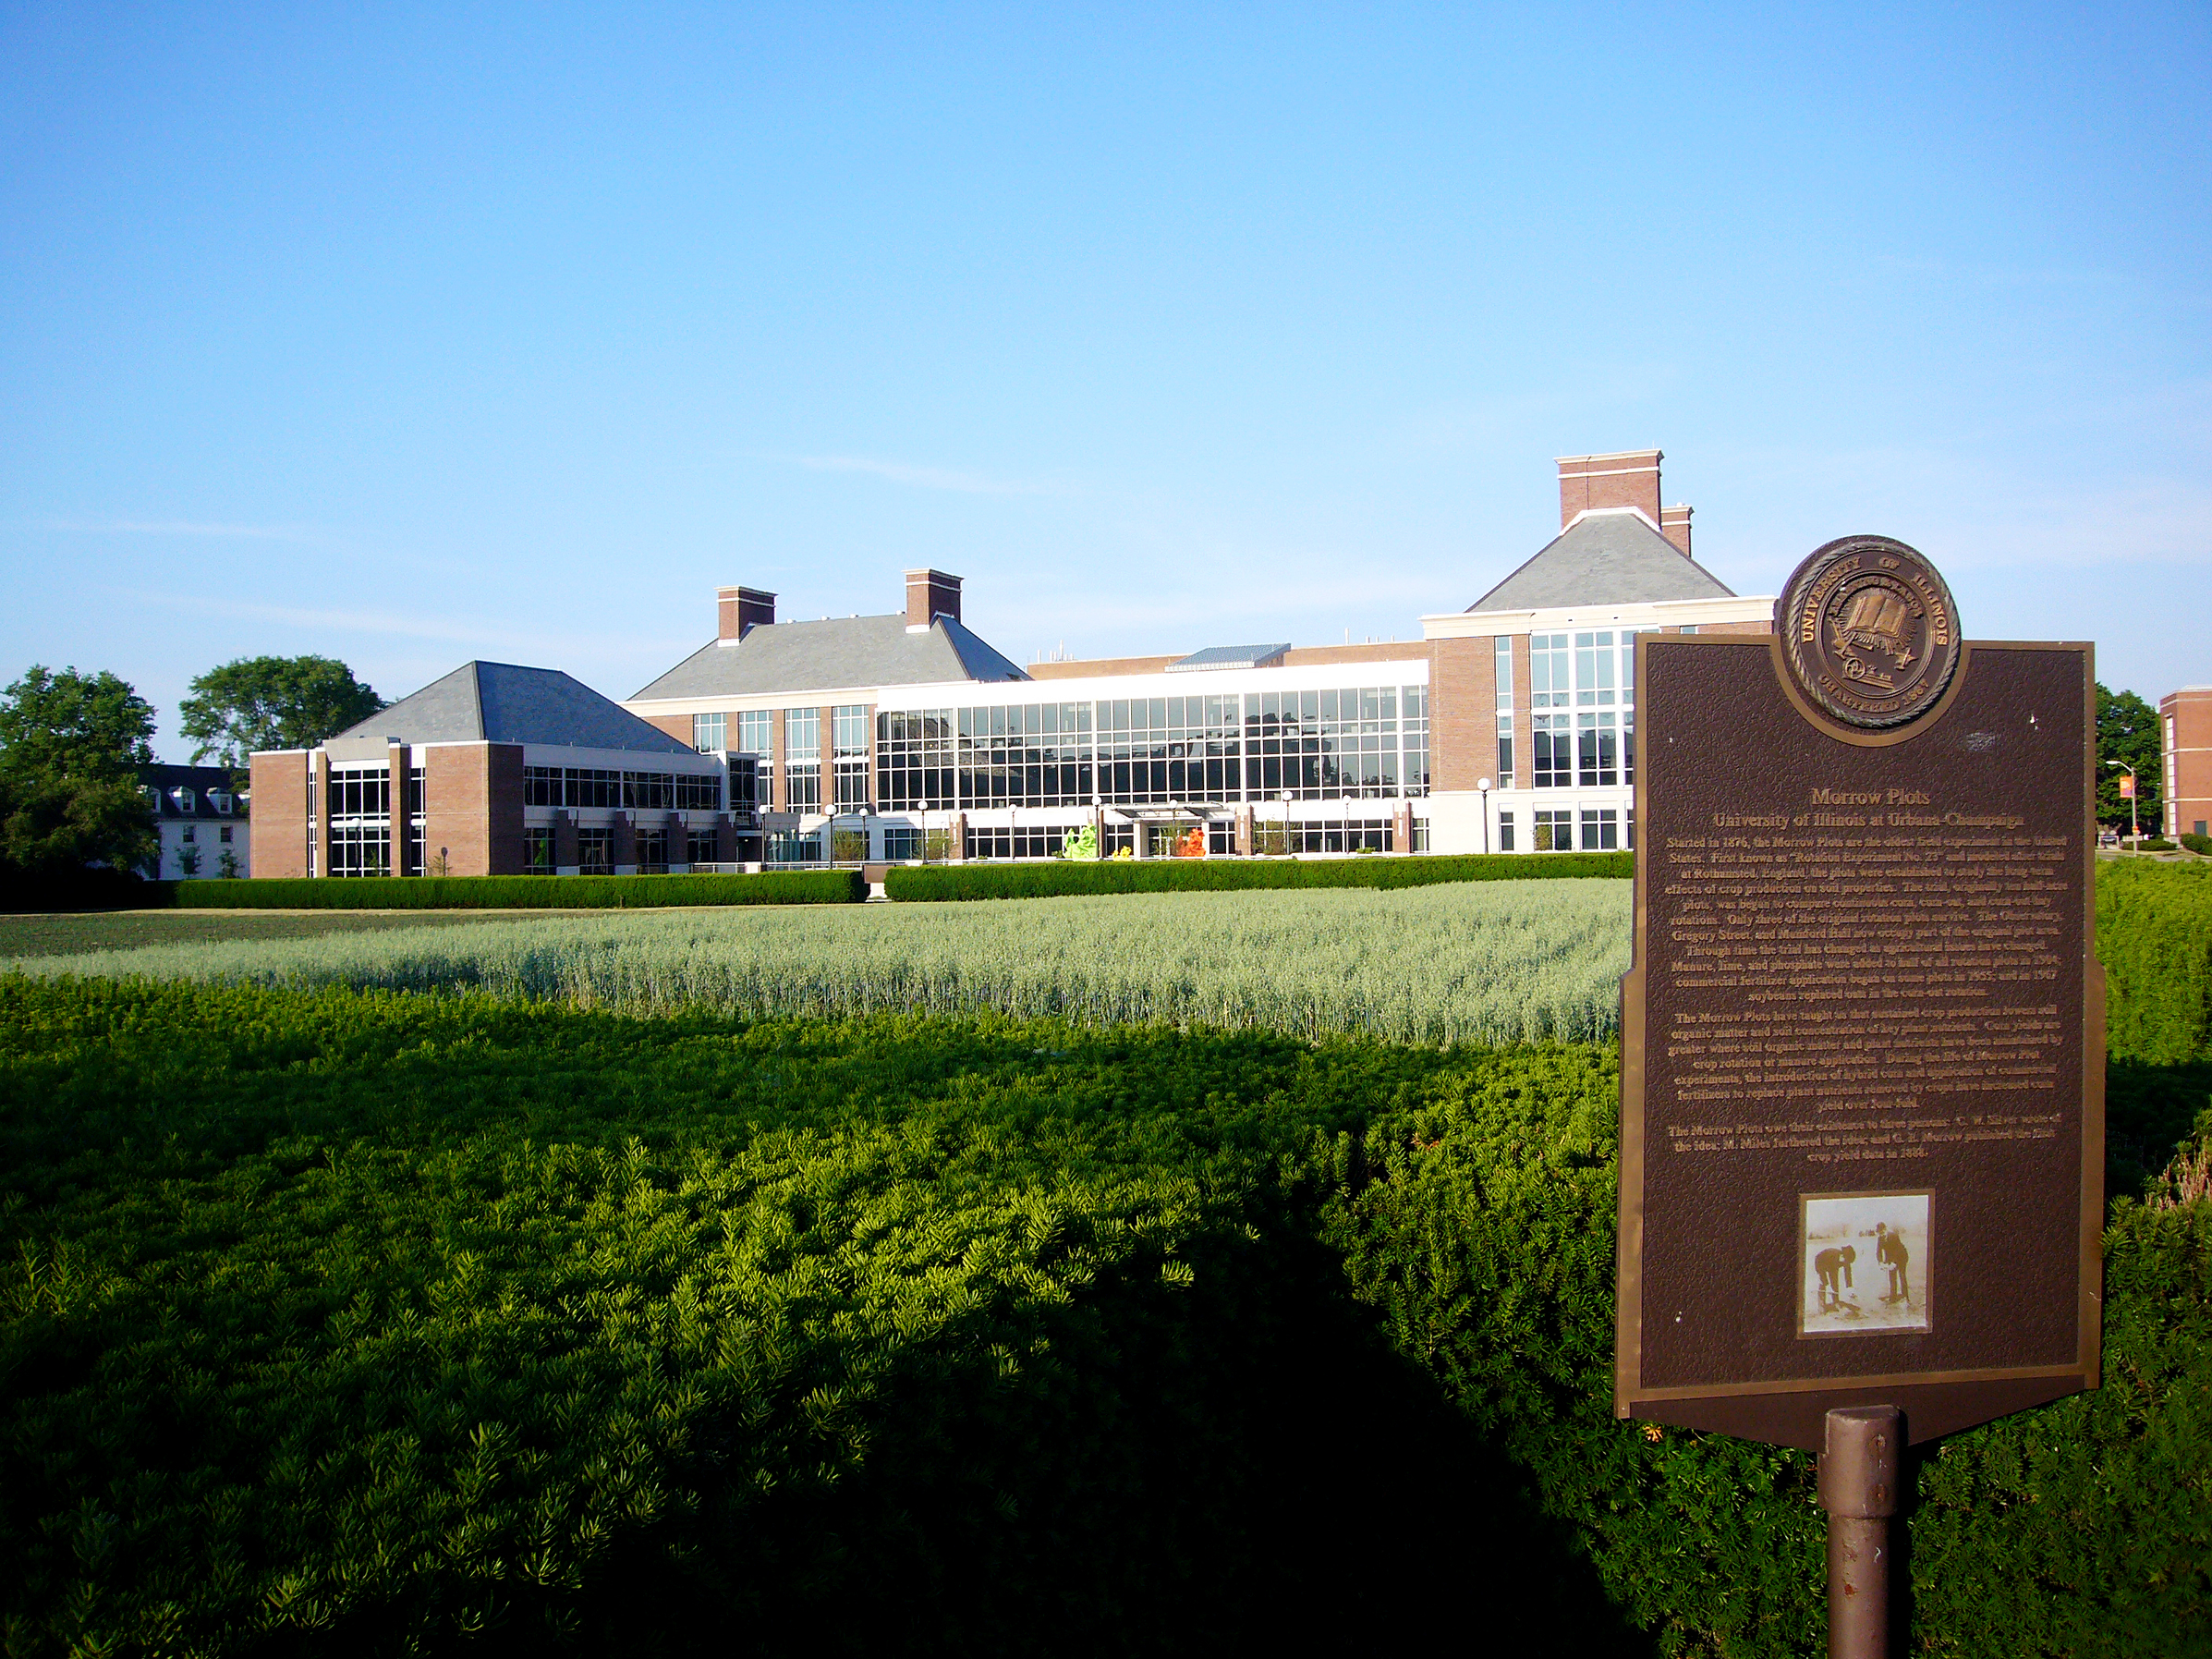 The Morrow Plots at University of Illinois at Urbana-Champaign.